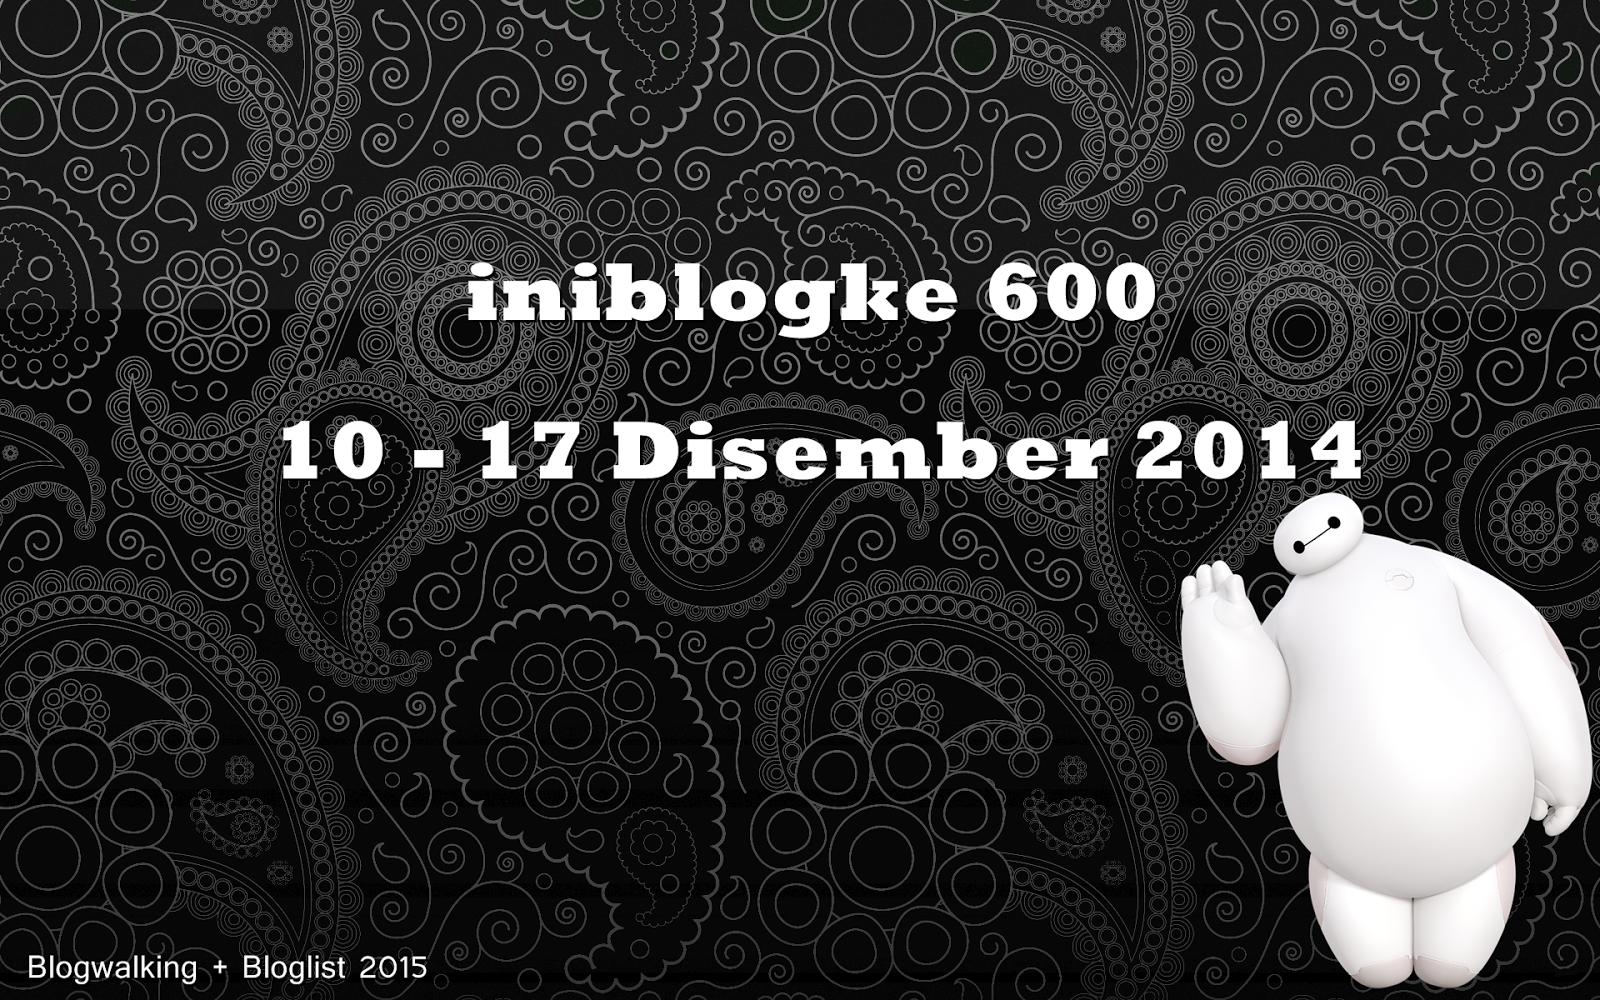 http://iniblogke.blogspot.com/2014/12/iniblogke-600-bloglist.html#.VI7zg3txhMs